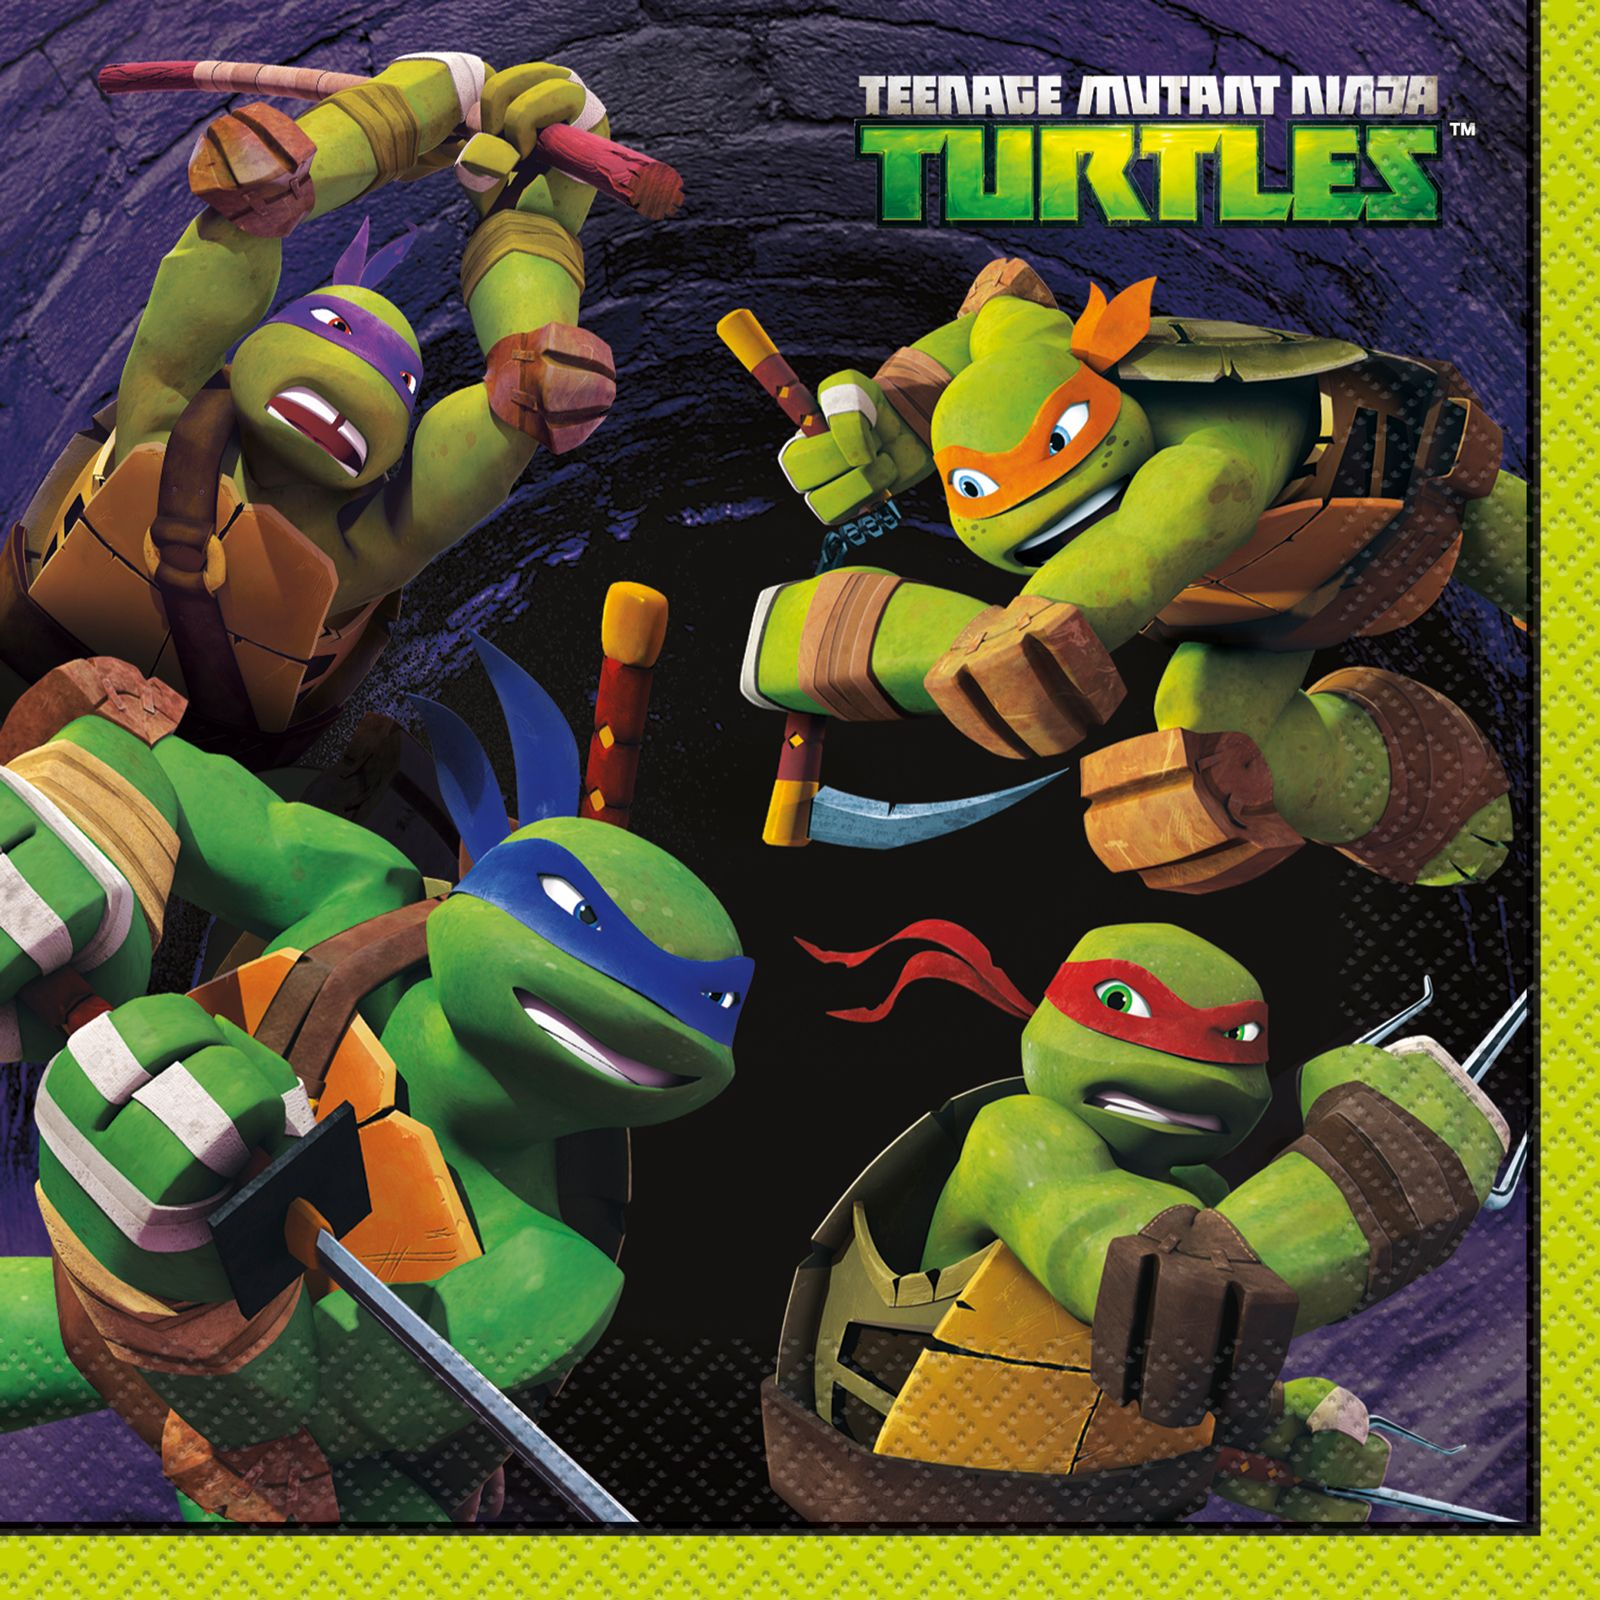 Nickelodeon Teenage Mutant Ninja Turtles Lunch Napkins Ninja Turtle Party Supplies Teenage Mutant Ninja Turtles Party Ninja Turtle Birthday